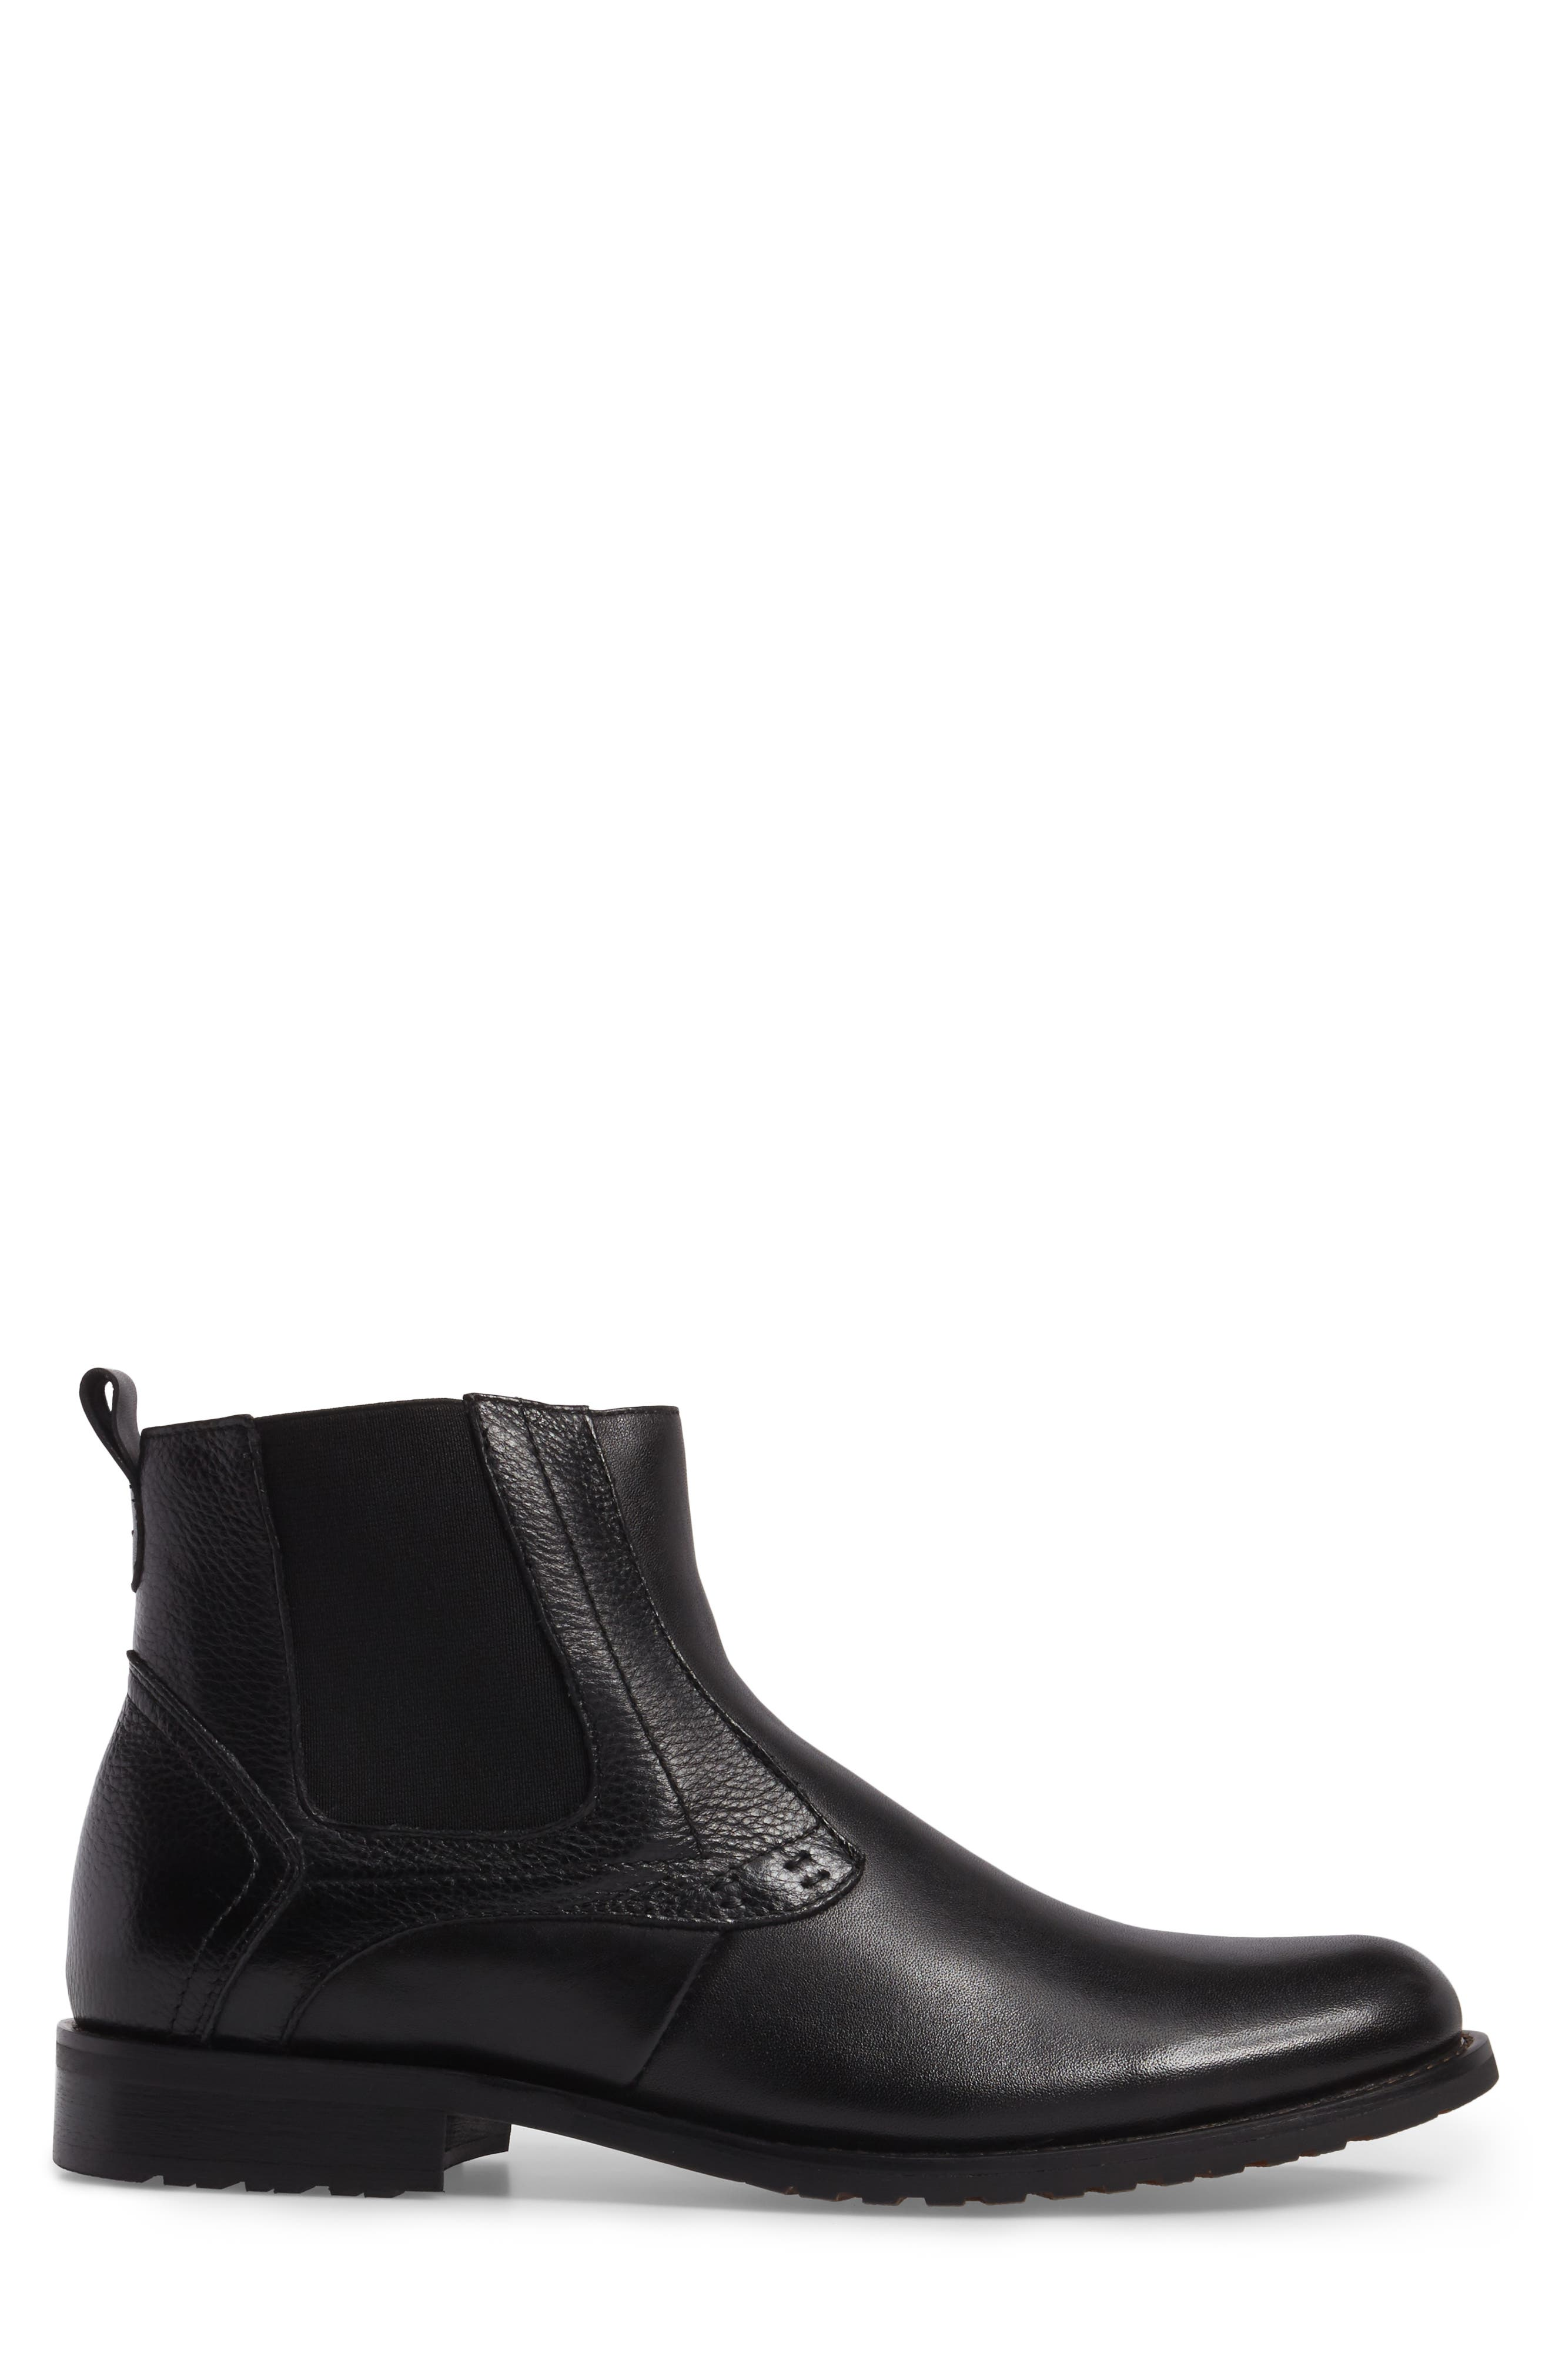 Oaks Chelsea Boot,                             Alternate thumbnail 3, color,                             Black Leather